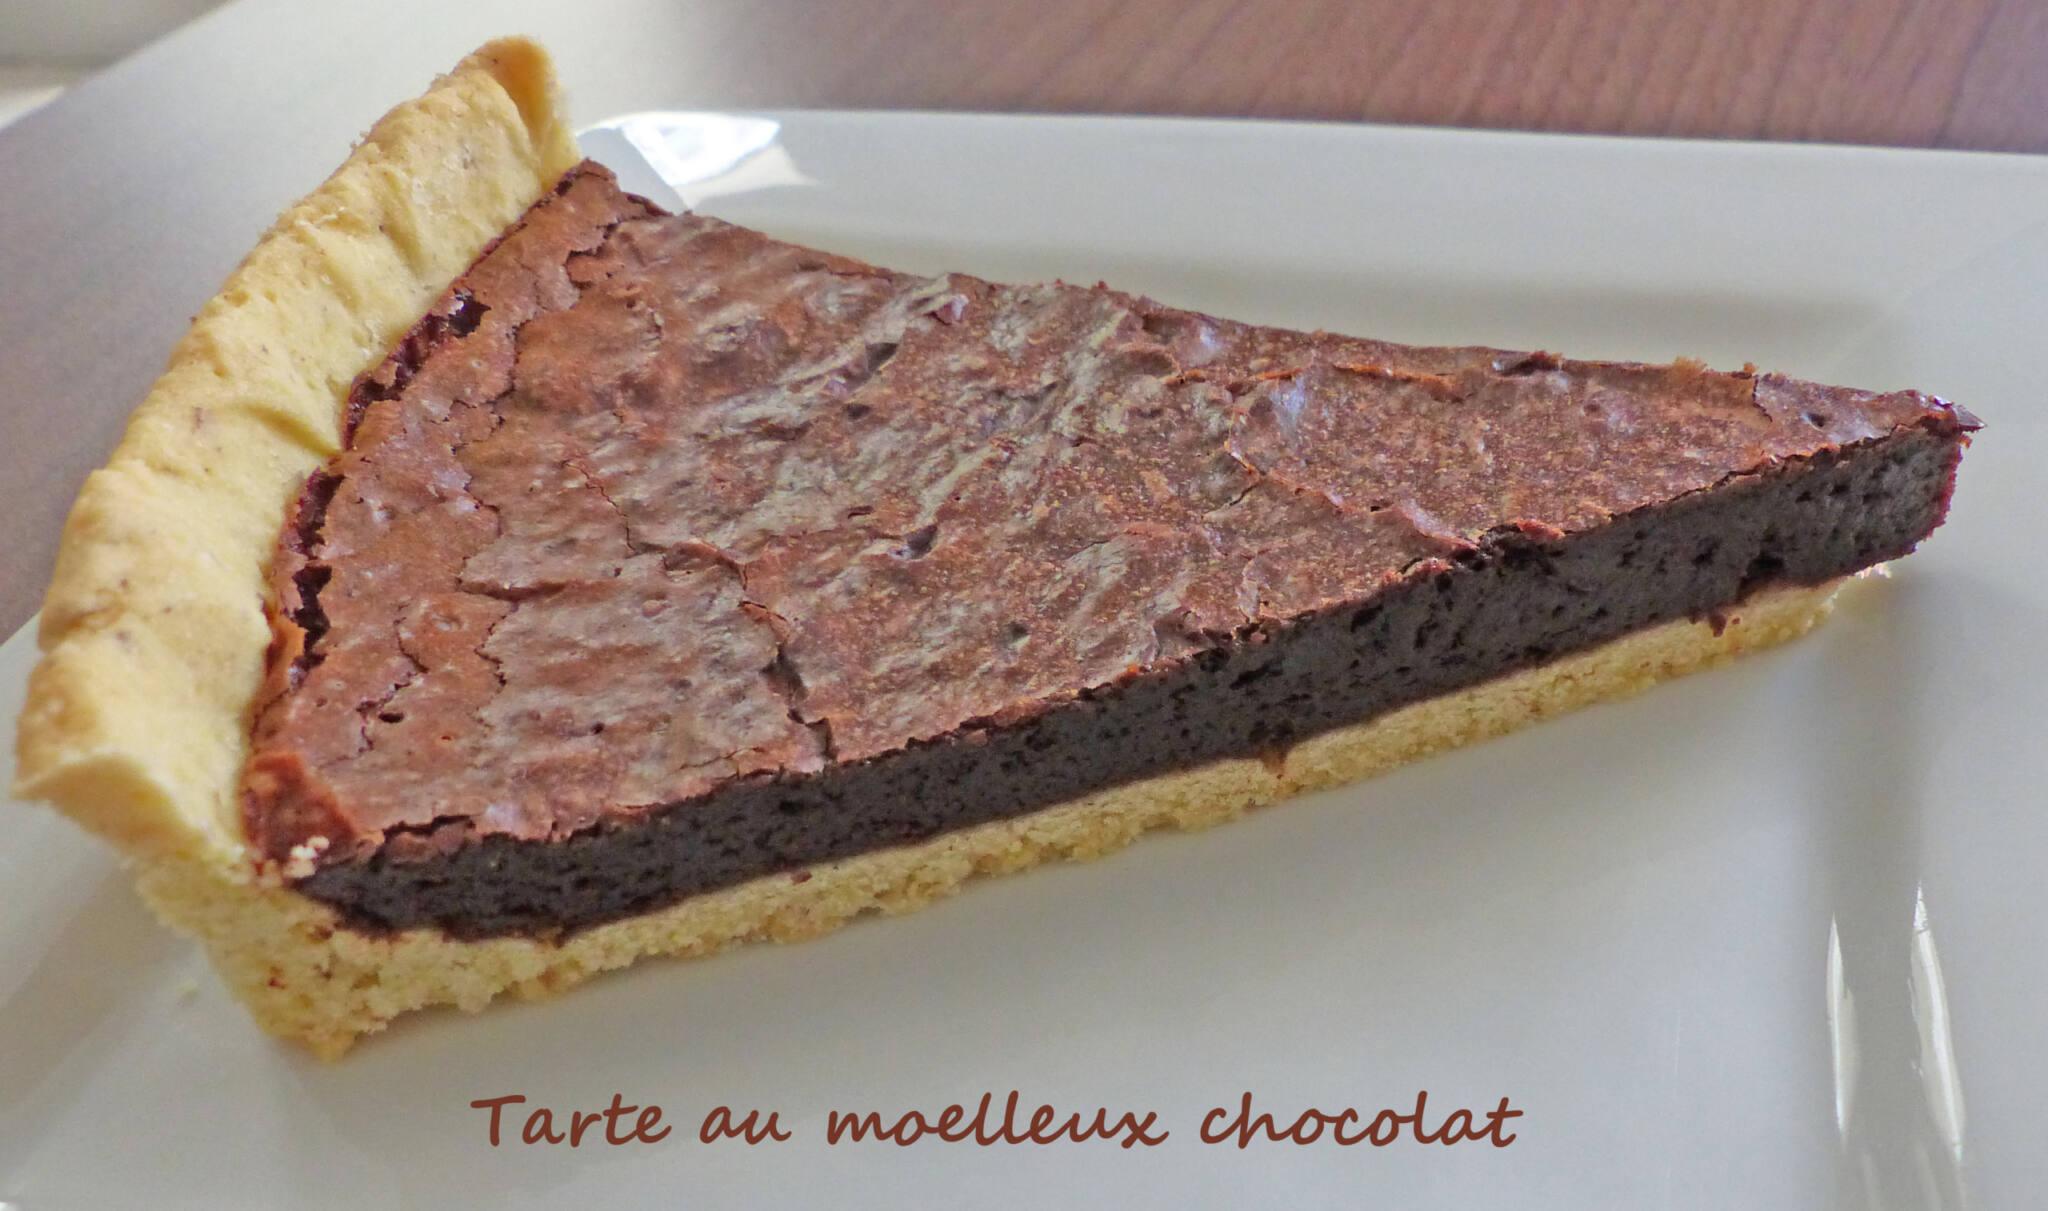 Tarte au moelleux chocolat P1250347 R